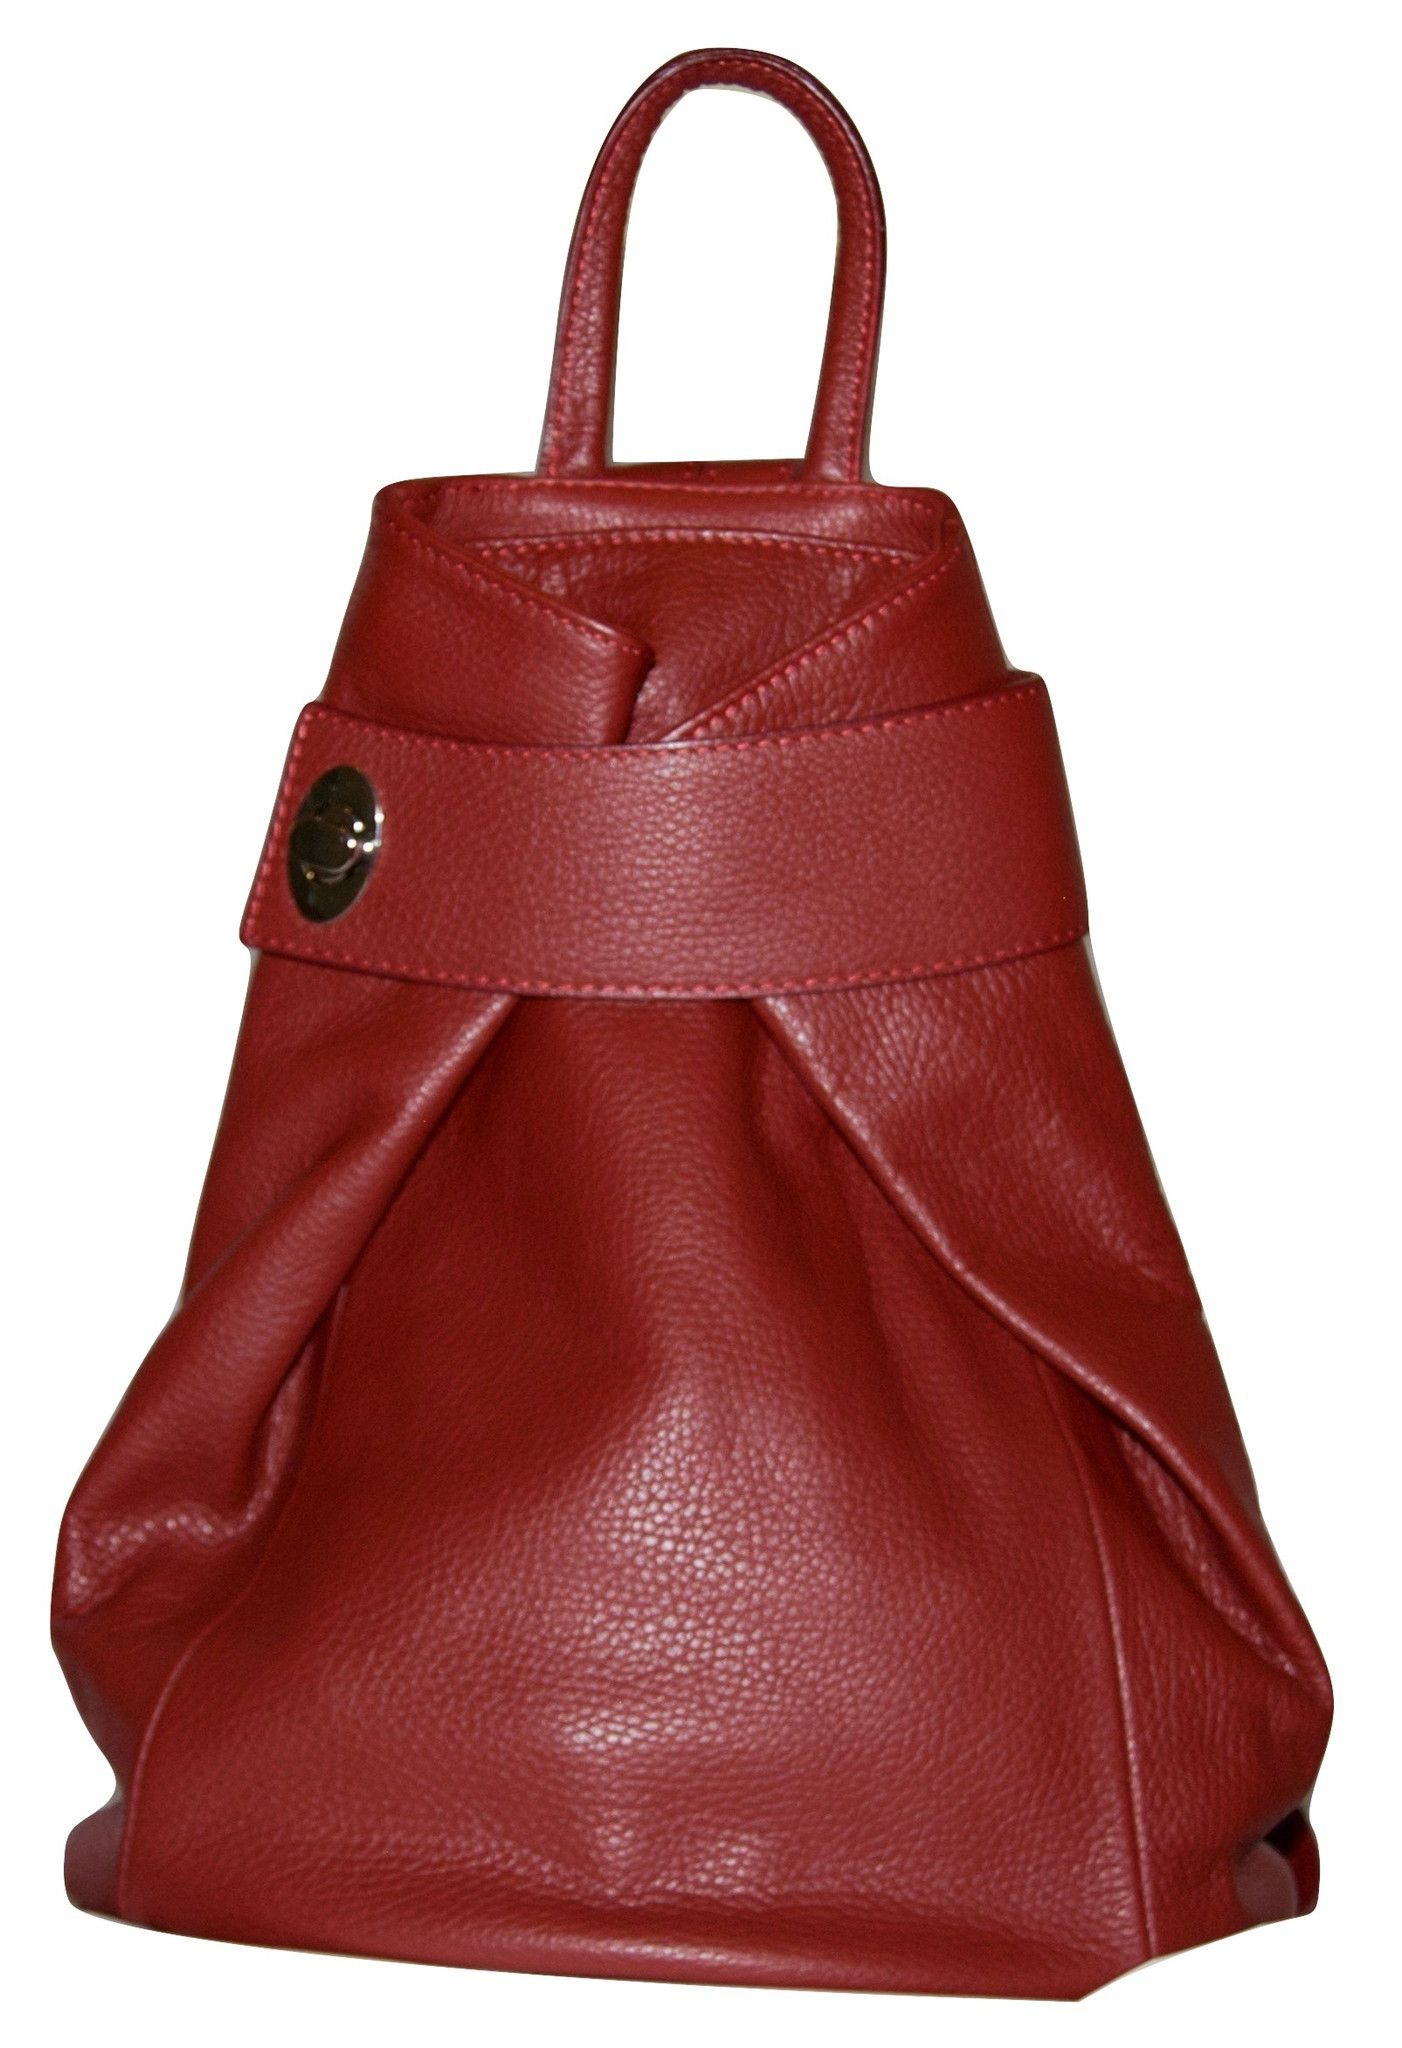 5a460660e7fd3 Stella Italian Leather Fashion Backpack Purse Top-Handle Shoulder ...